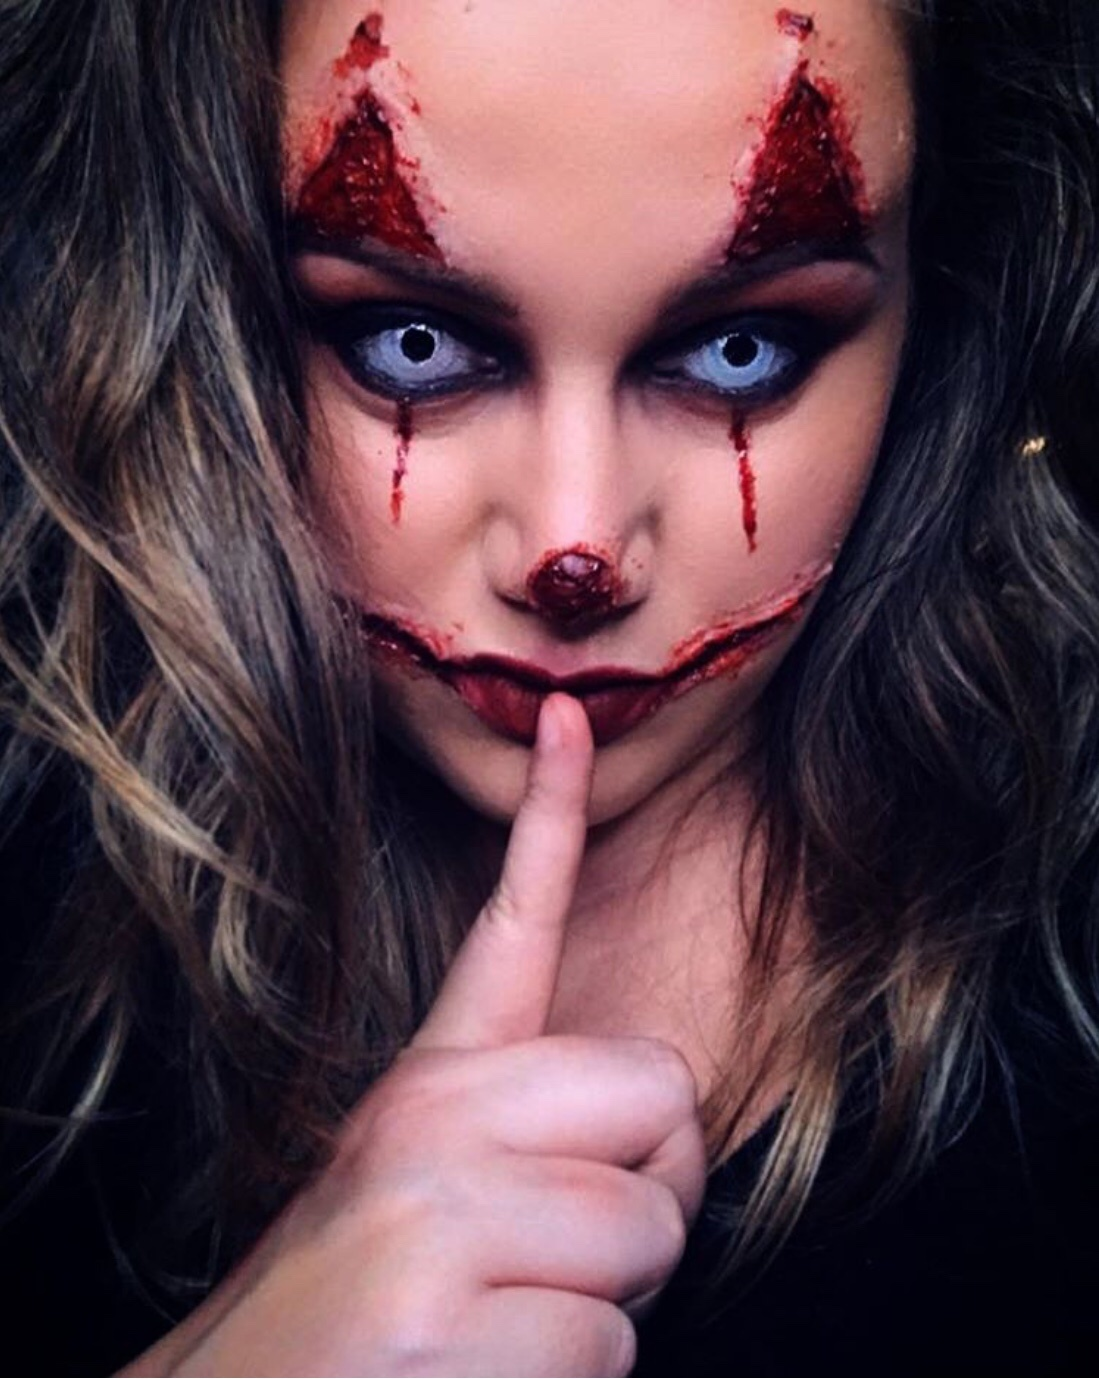 diy joker's mouth slit halloween makeup tips